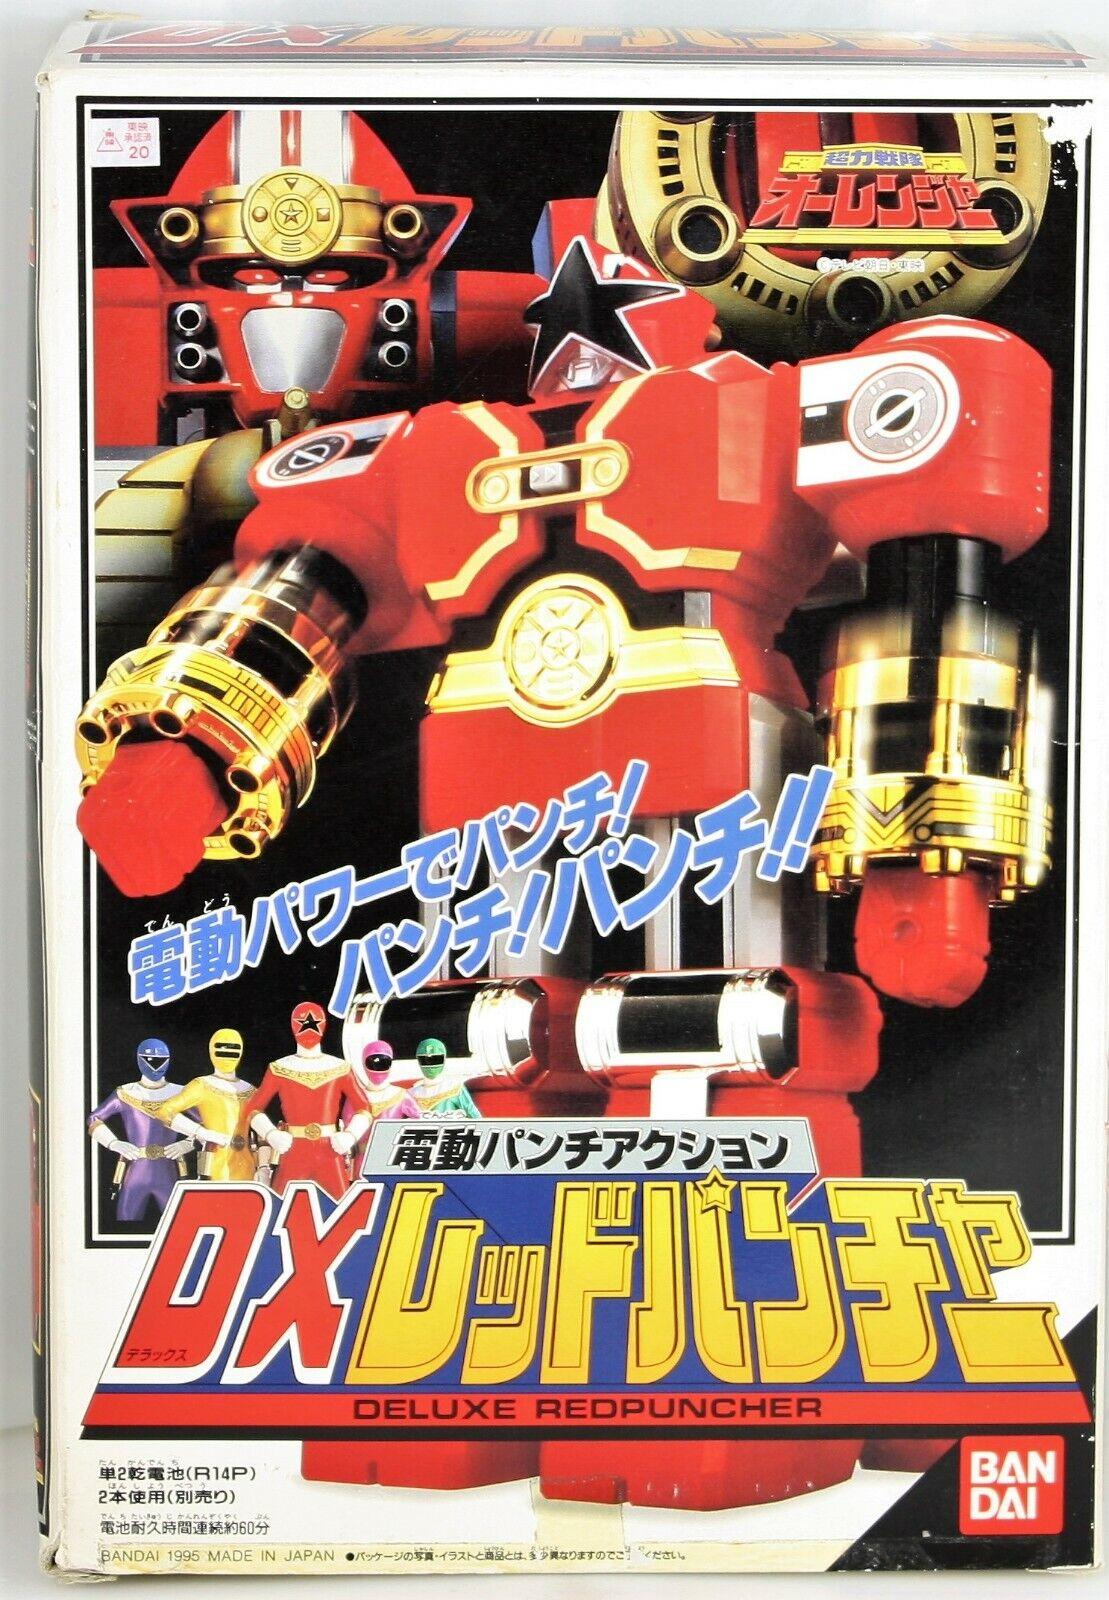 Energia Rangers  Zeo Ohranger DX Zeo Megazord rossoPuncher Beai Japan 1995 MMPR  negozio outlet